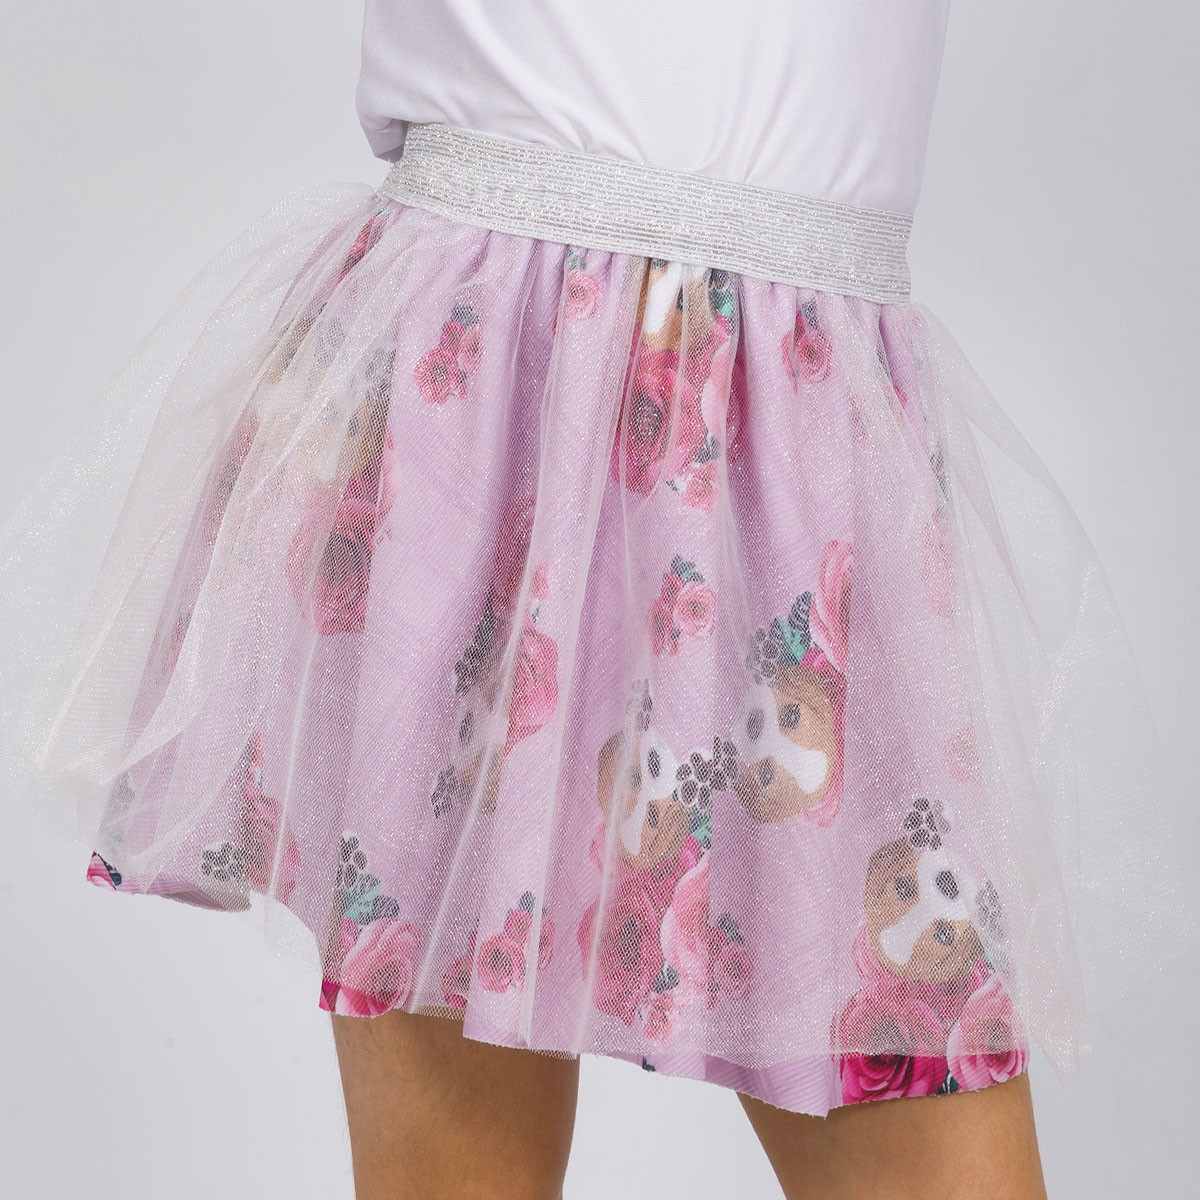 Saia Infantil Bailarina Beagle Xadrez Rosa